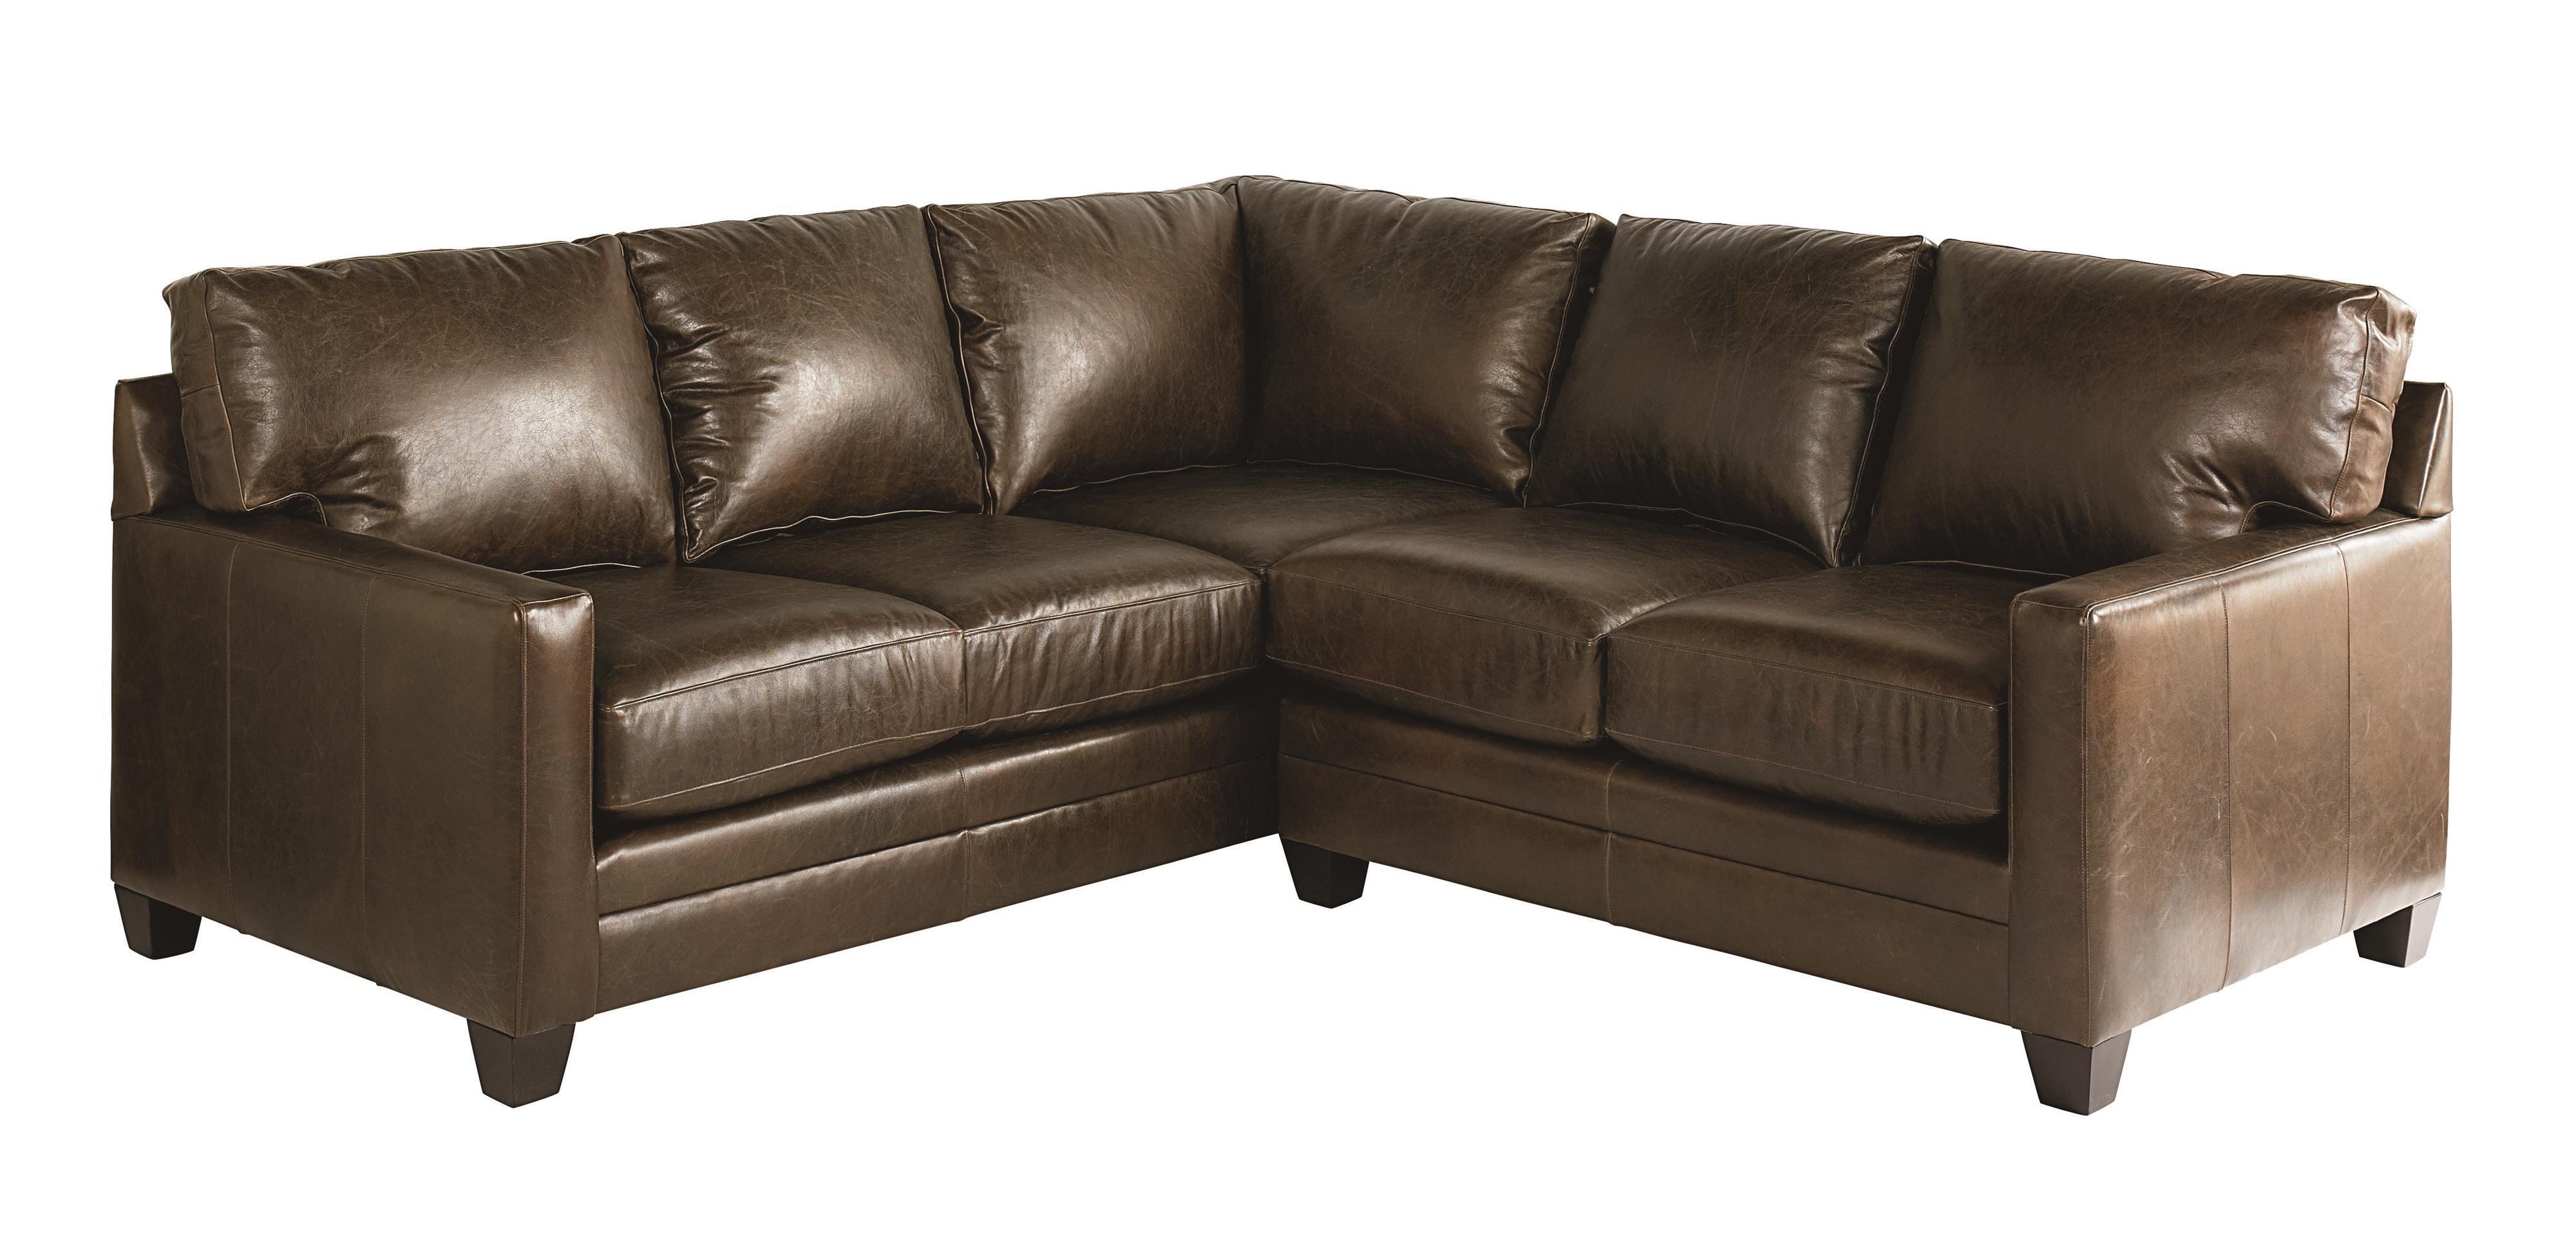 Bassett ladson sectional sofa dunk bright furniture for Small sectional sofa bassett